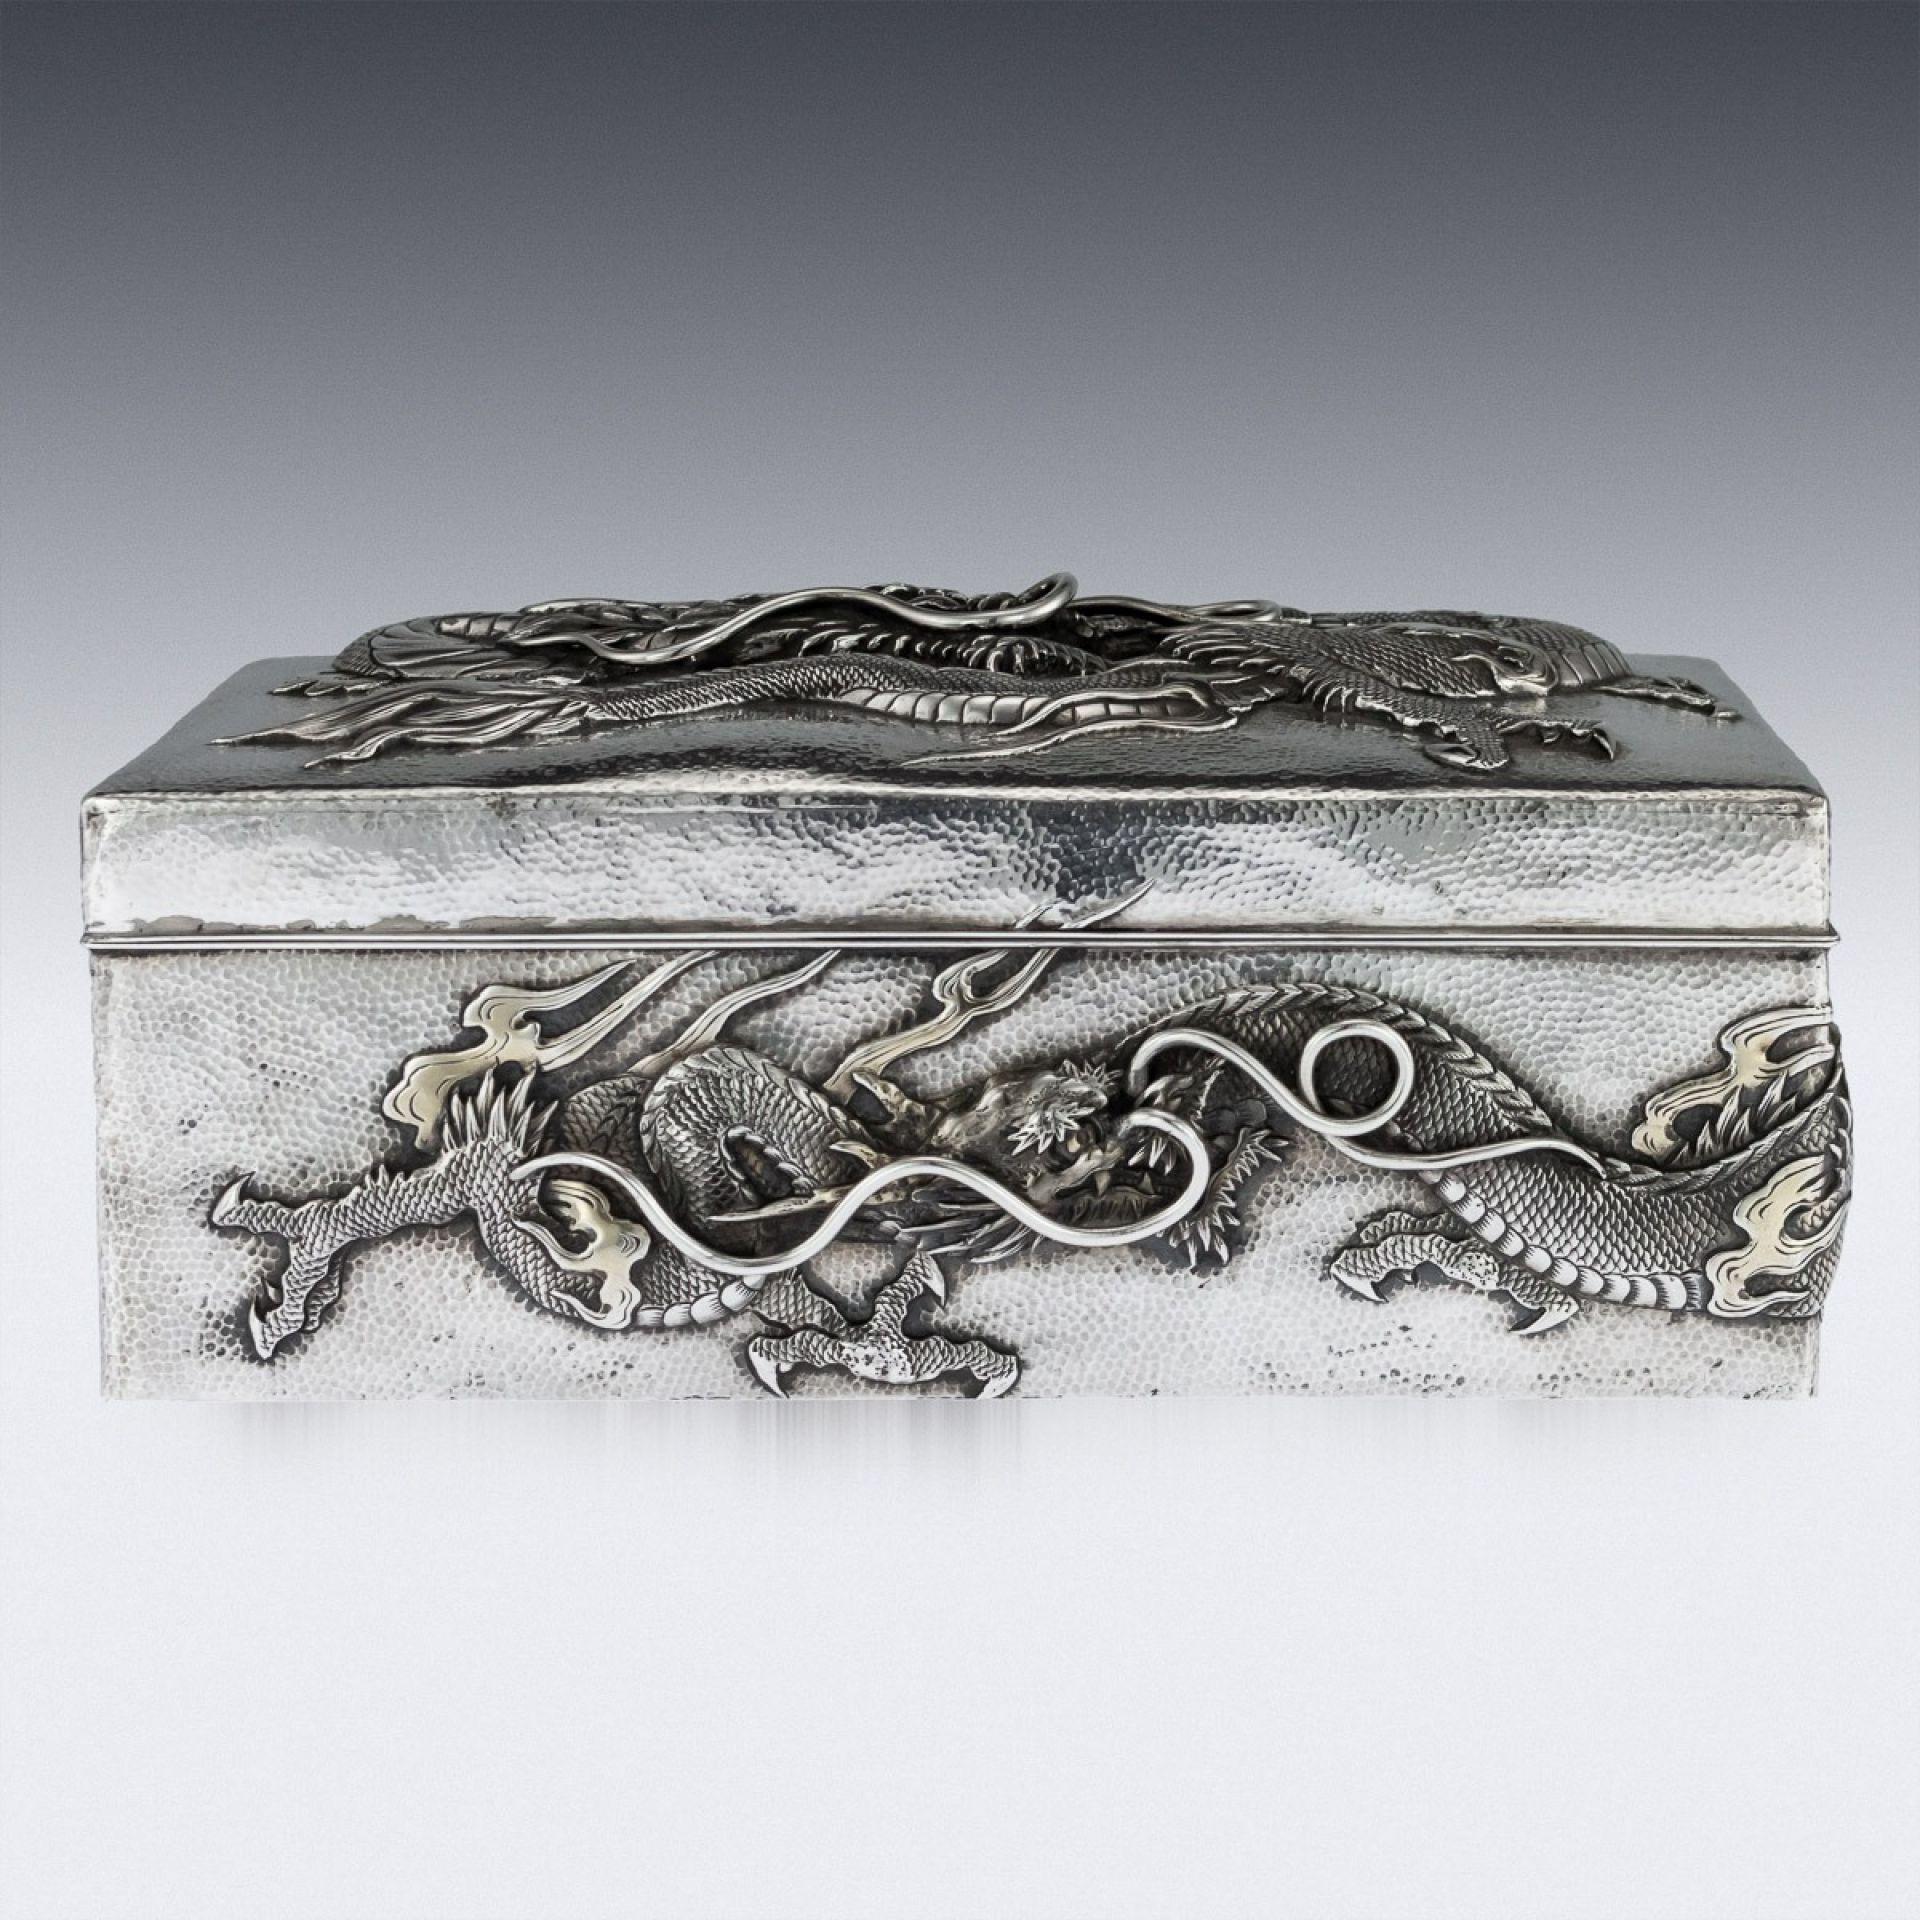 ANTIQUE 20thC JAPANESE MEIJI SOLID SILVER DRAGON BOX, SAMURAI SHOKAI c.1900